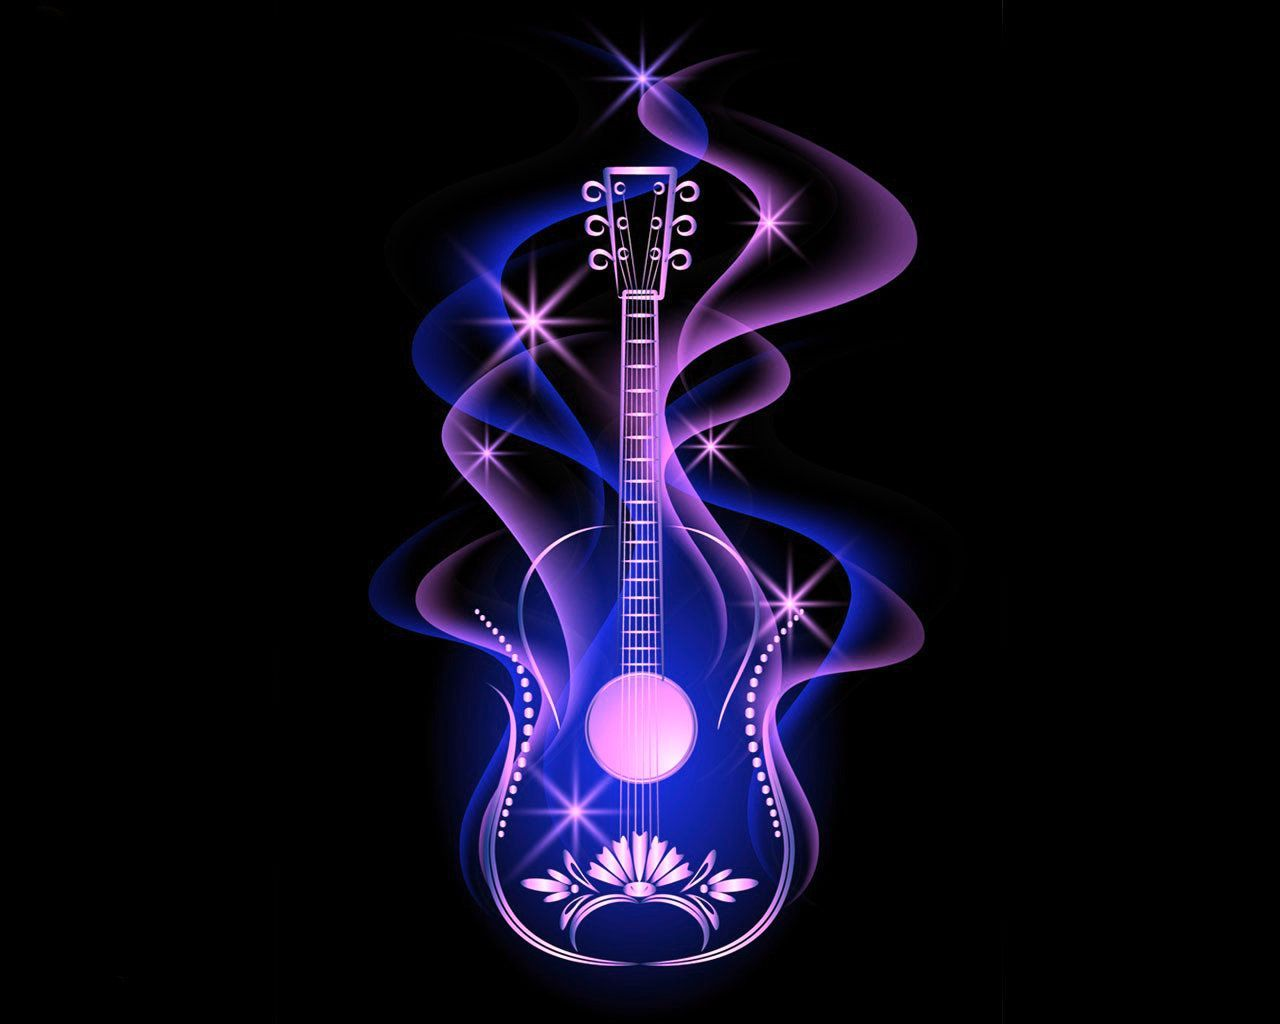 55+ Colorful Guitar Wallpapers Download at WallpaperBro